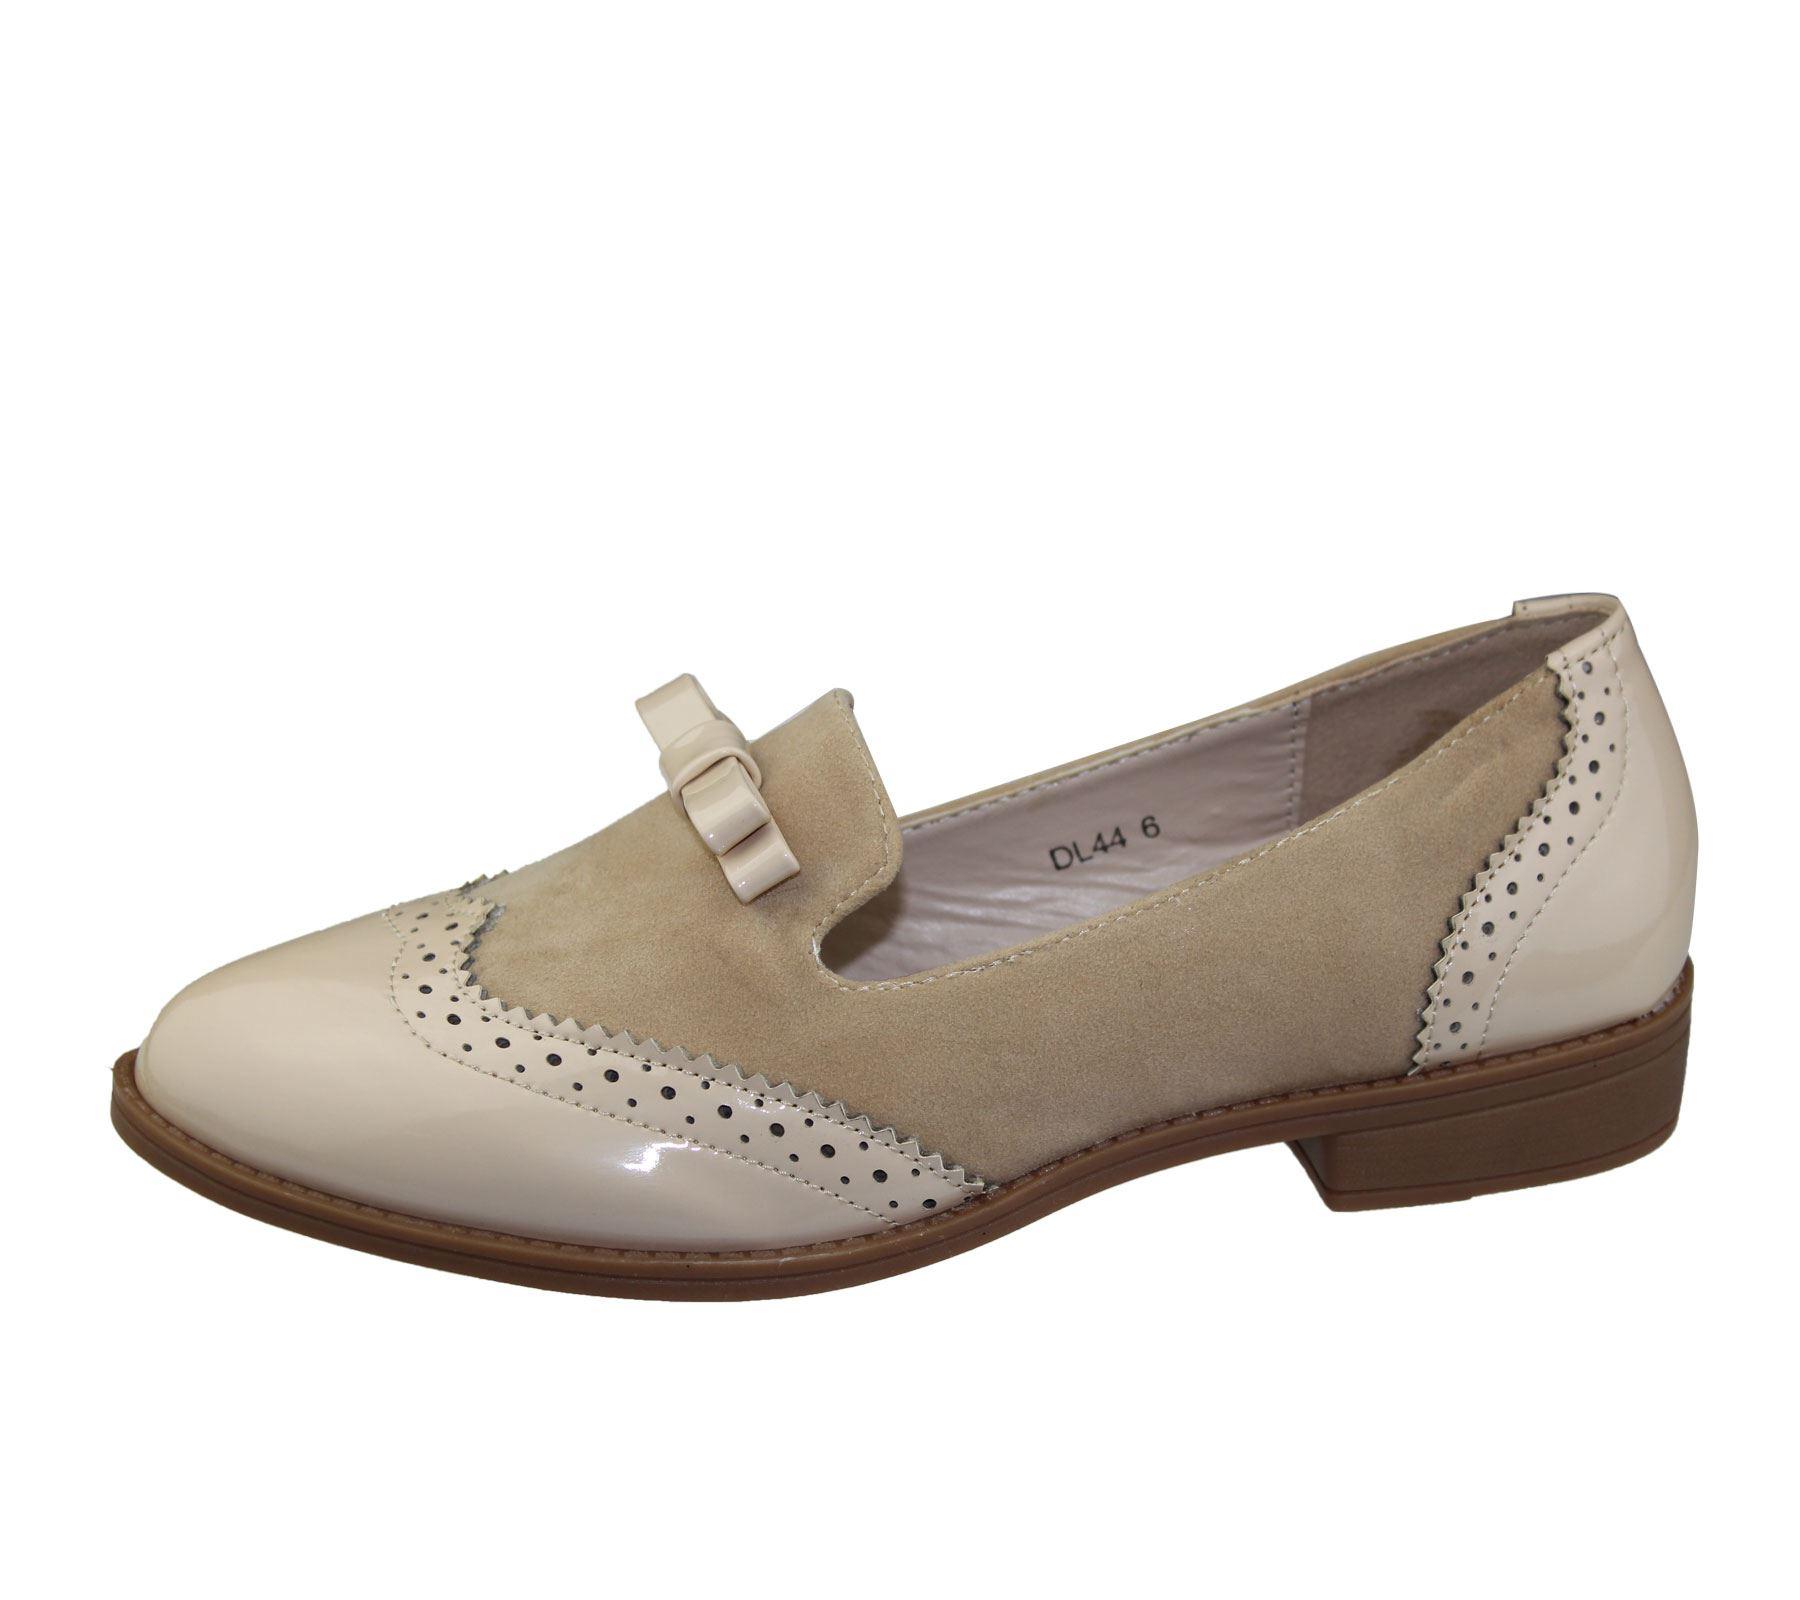 womens slip on shoes ladies fringe flat oxford loafer